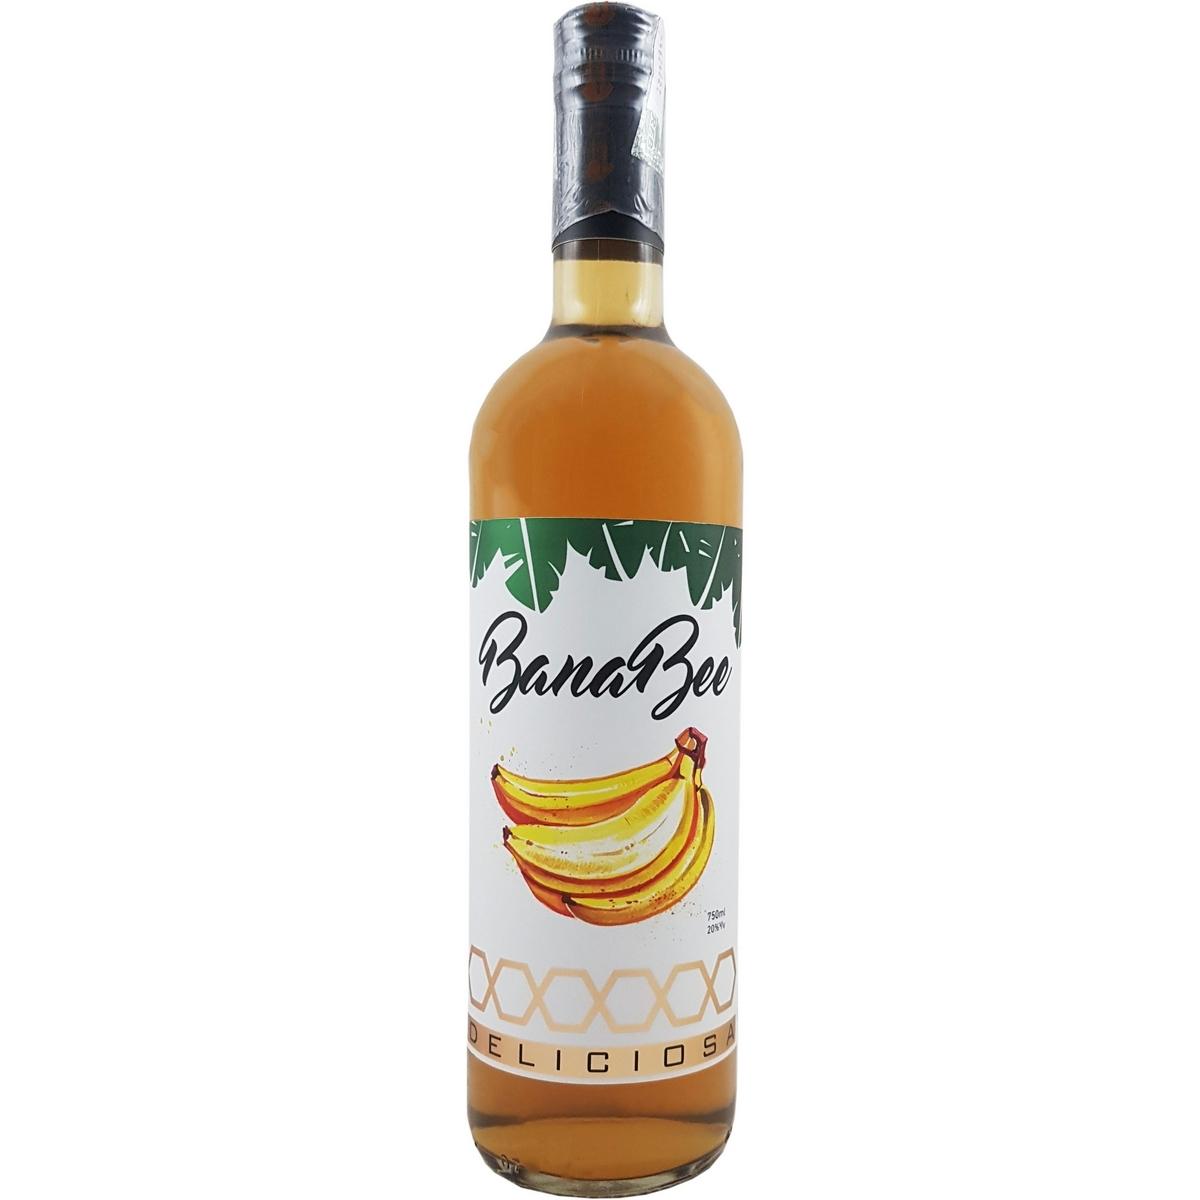 Bebida Mista Banabee com Banana Mel e Canela  750ml